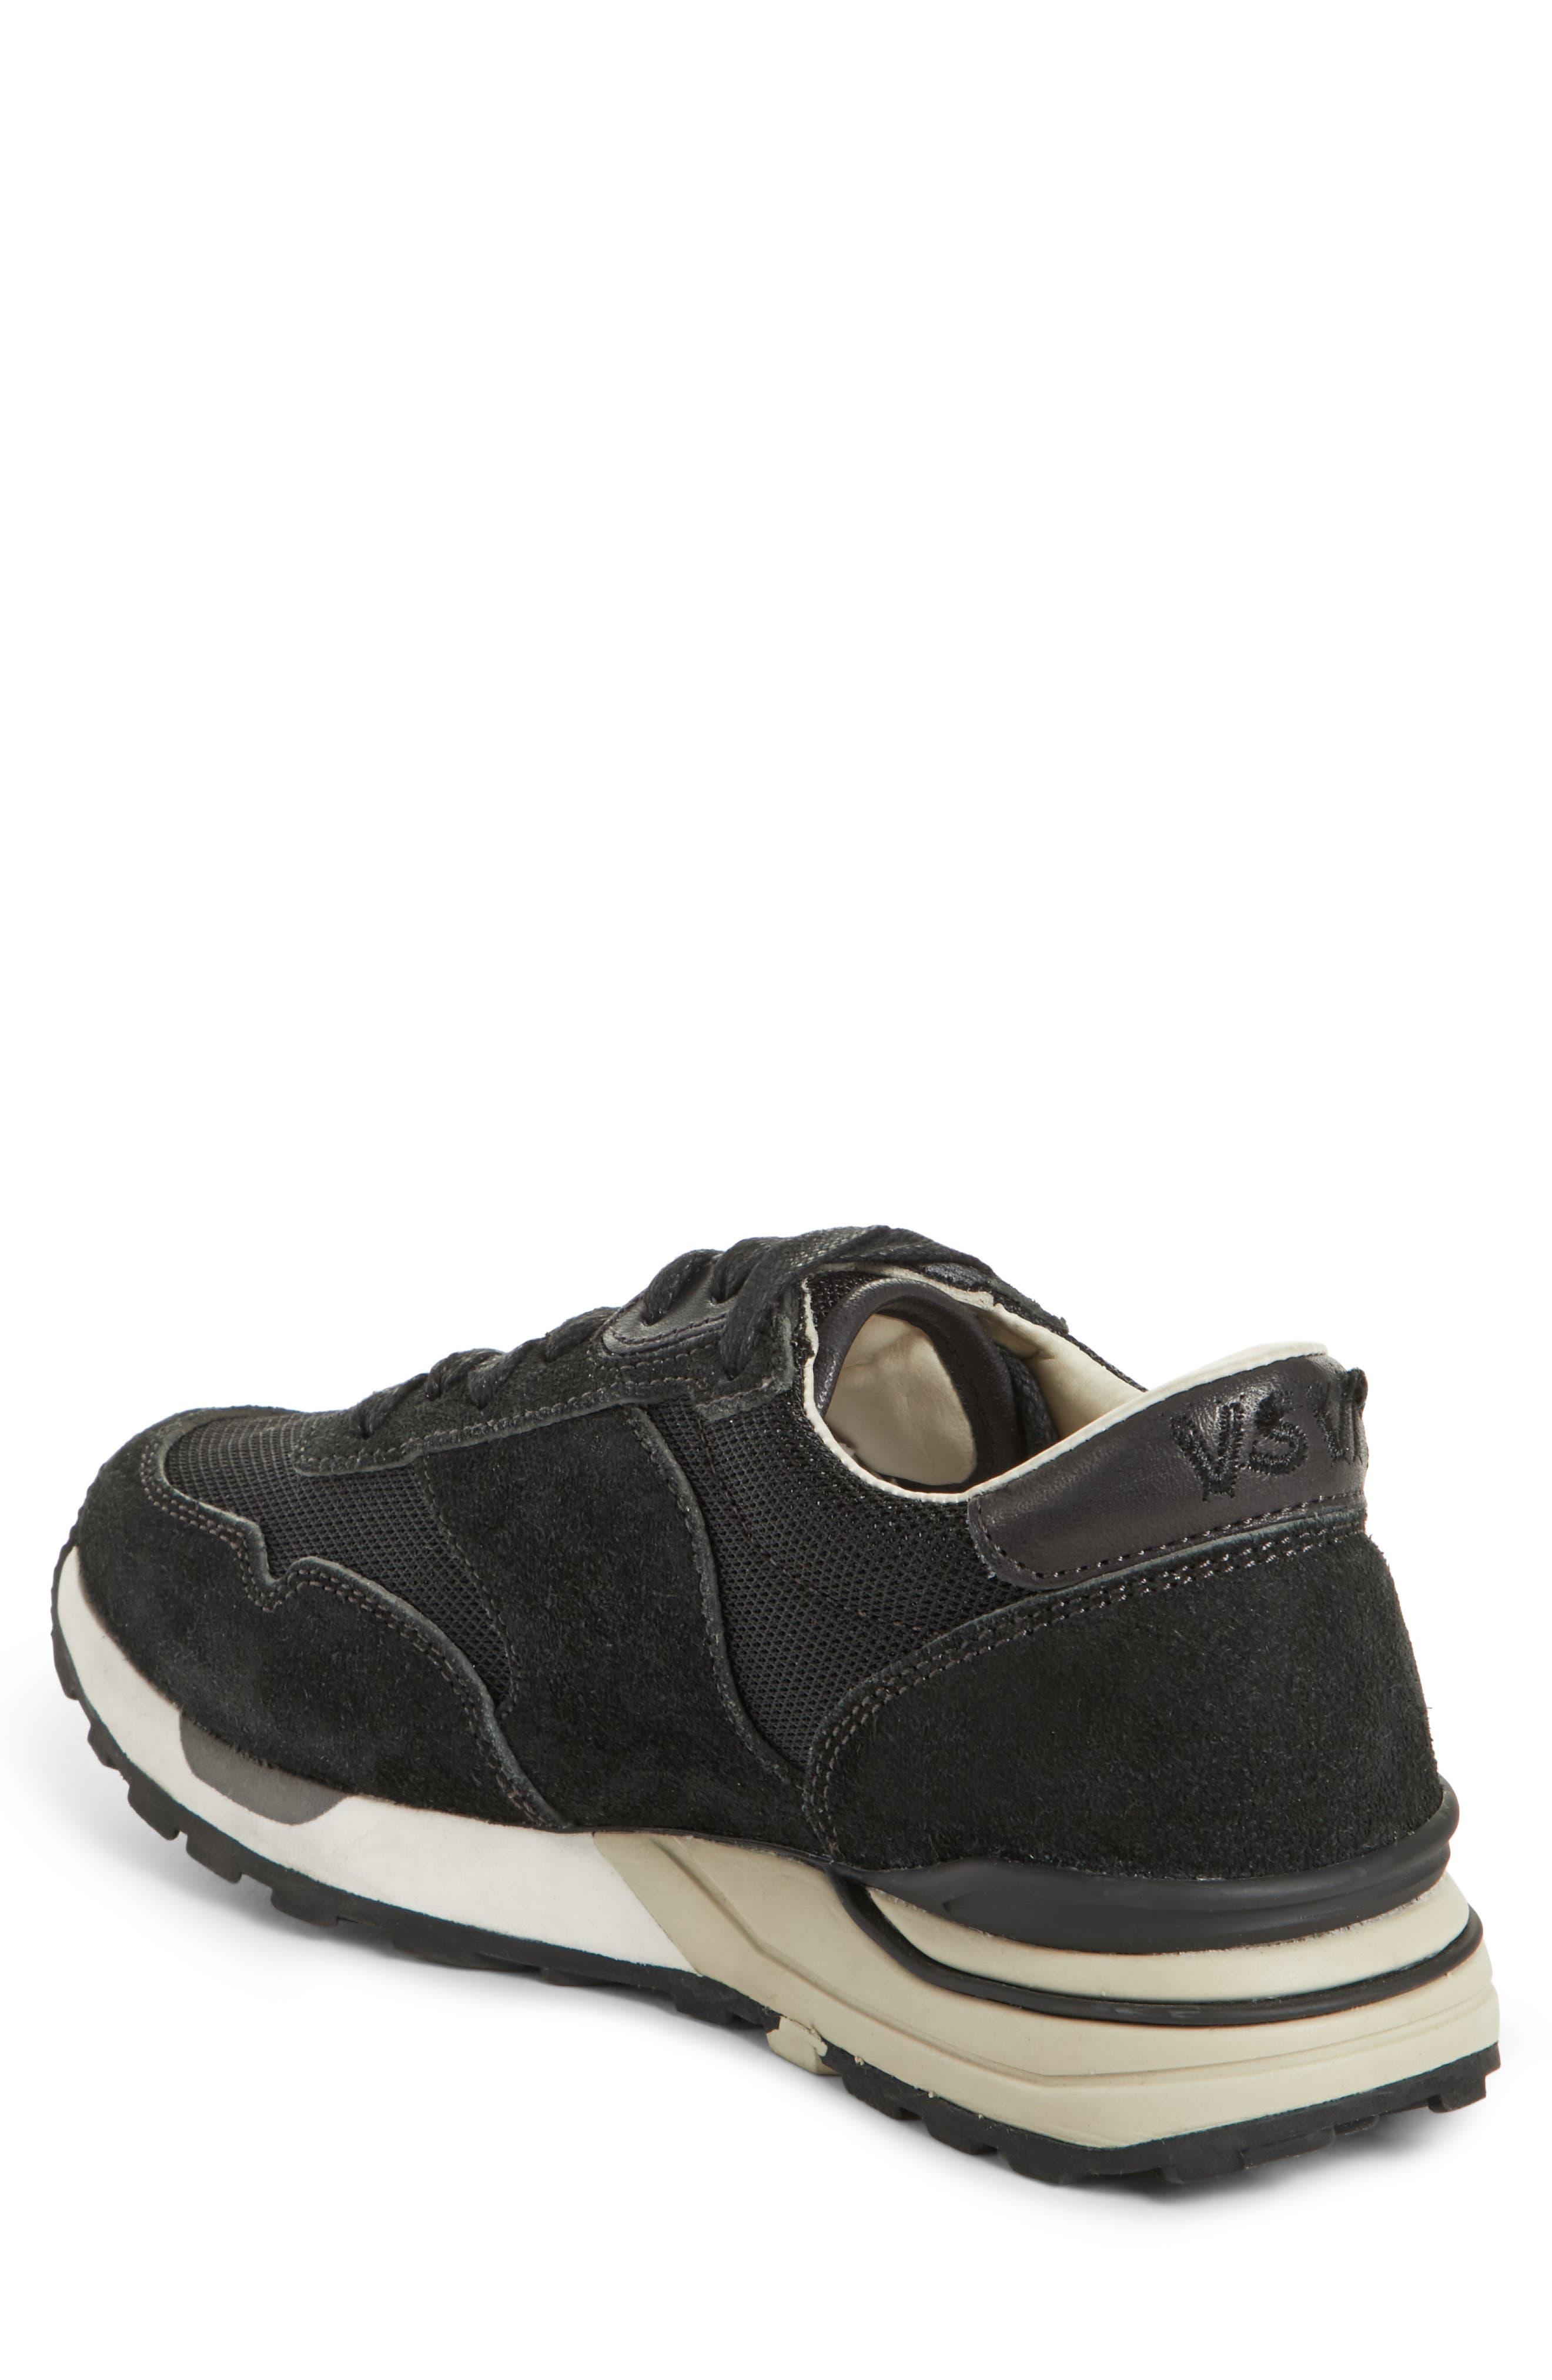 Roland Jogger Sneaker,                             Alternate thumbnail 2, color,                             002